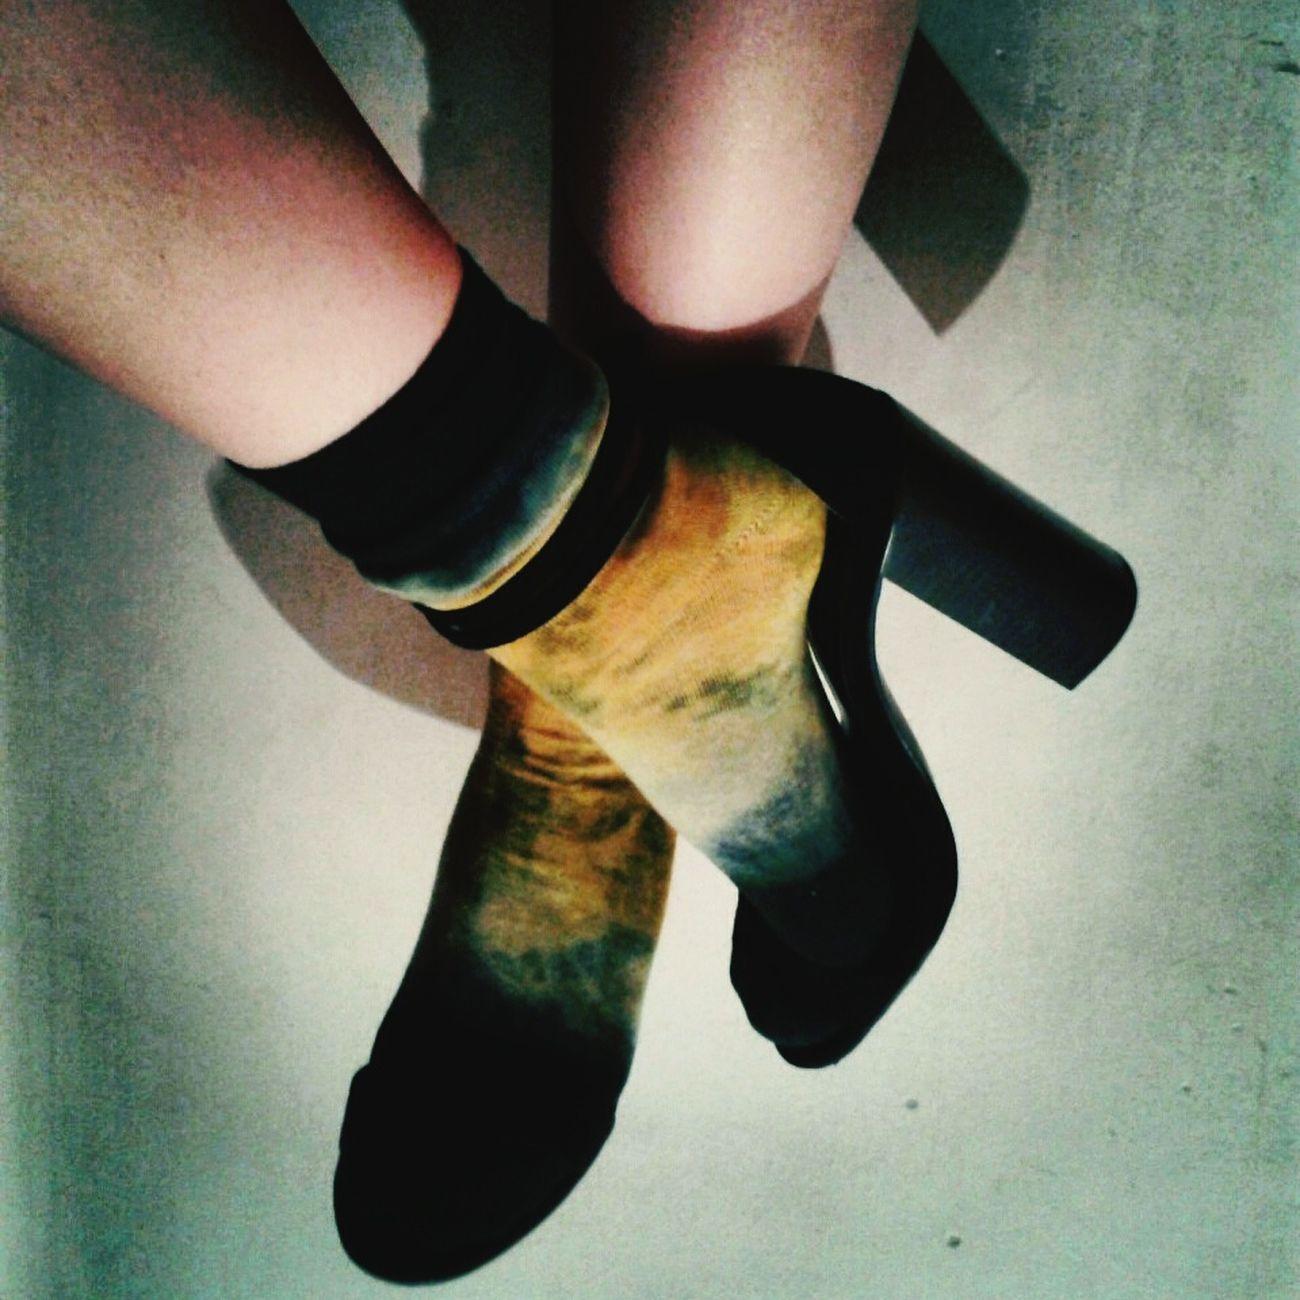 Funlable Socks .my new brand socks ^^